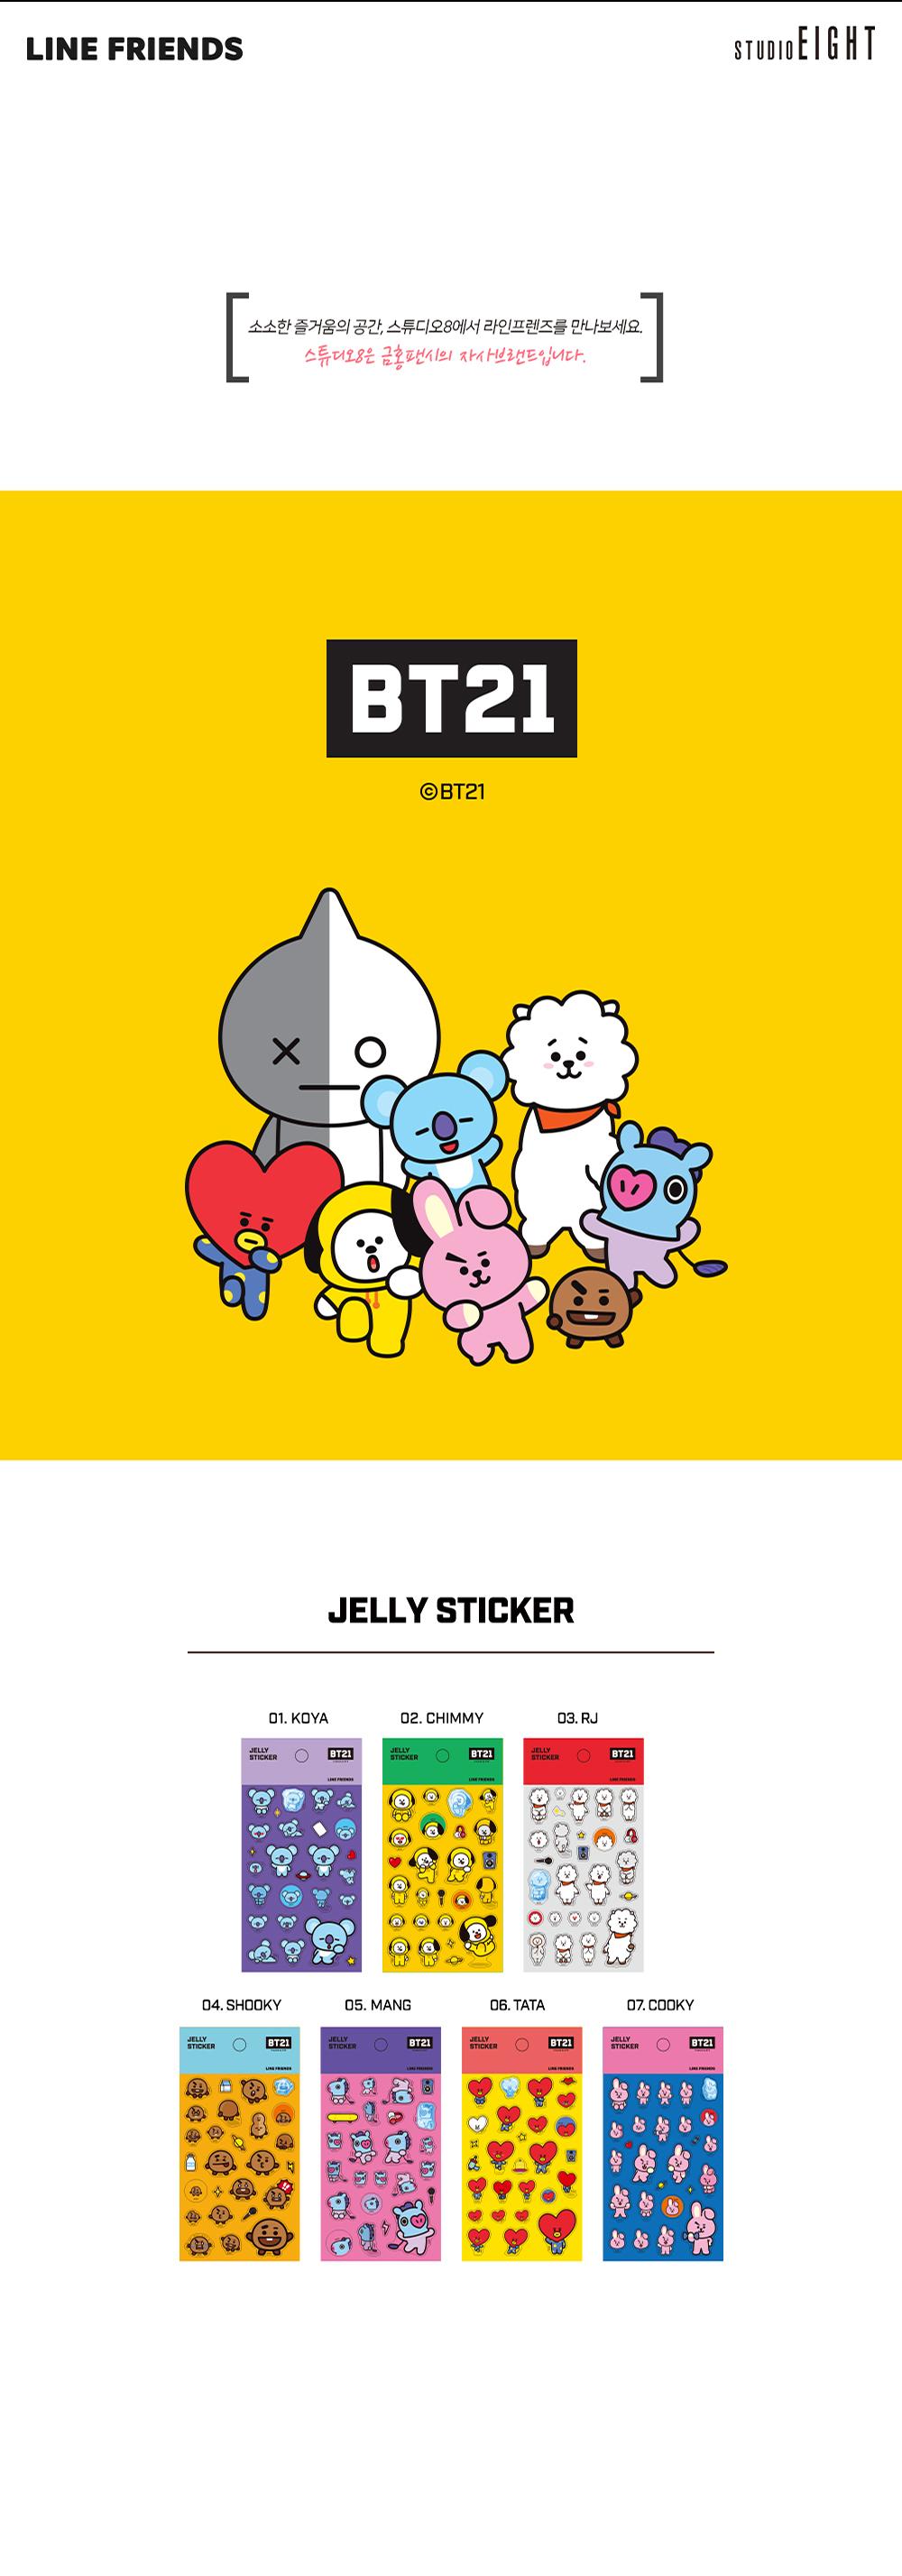 bt21_kf_jellysticker_01.jpg